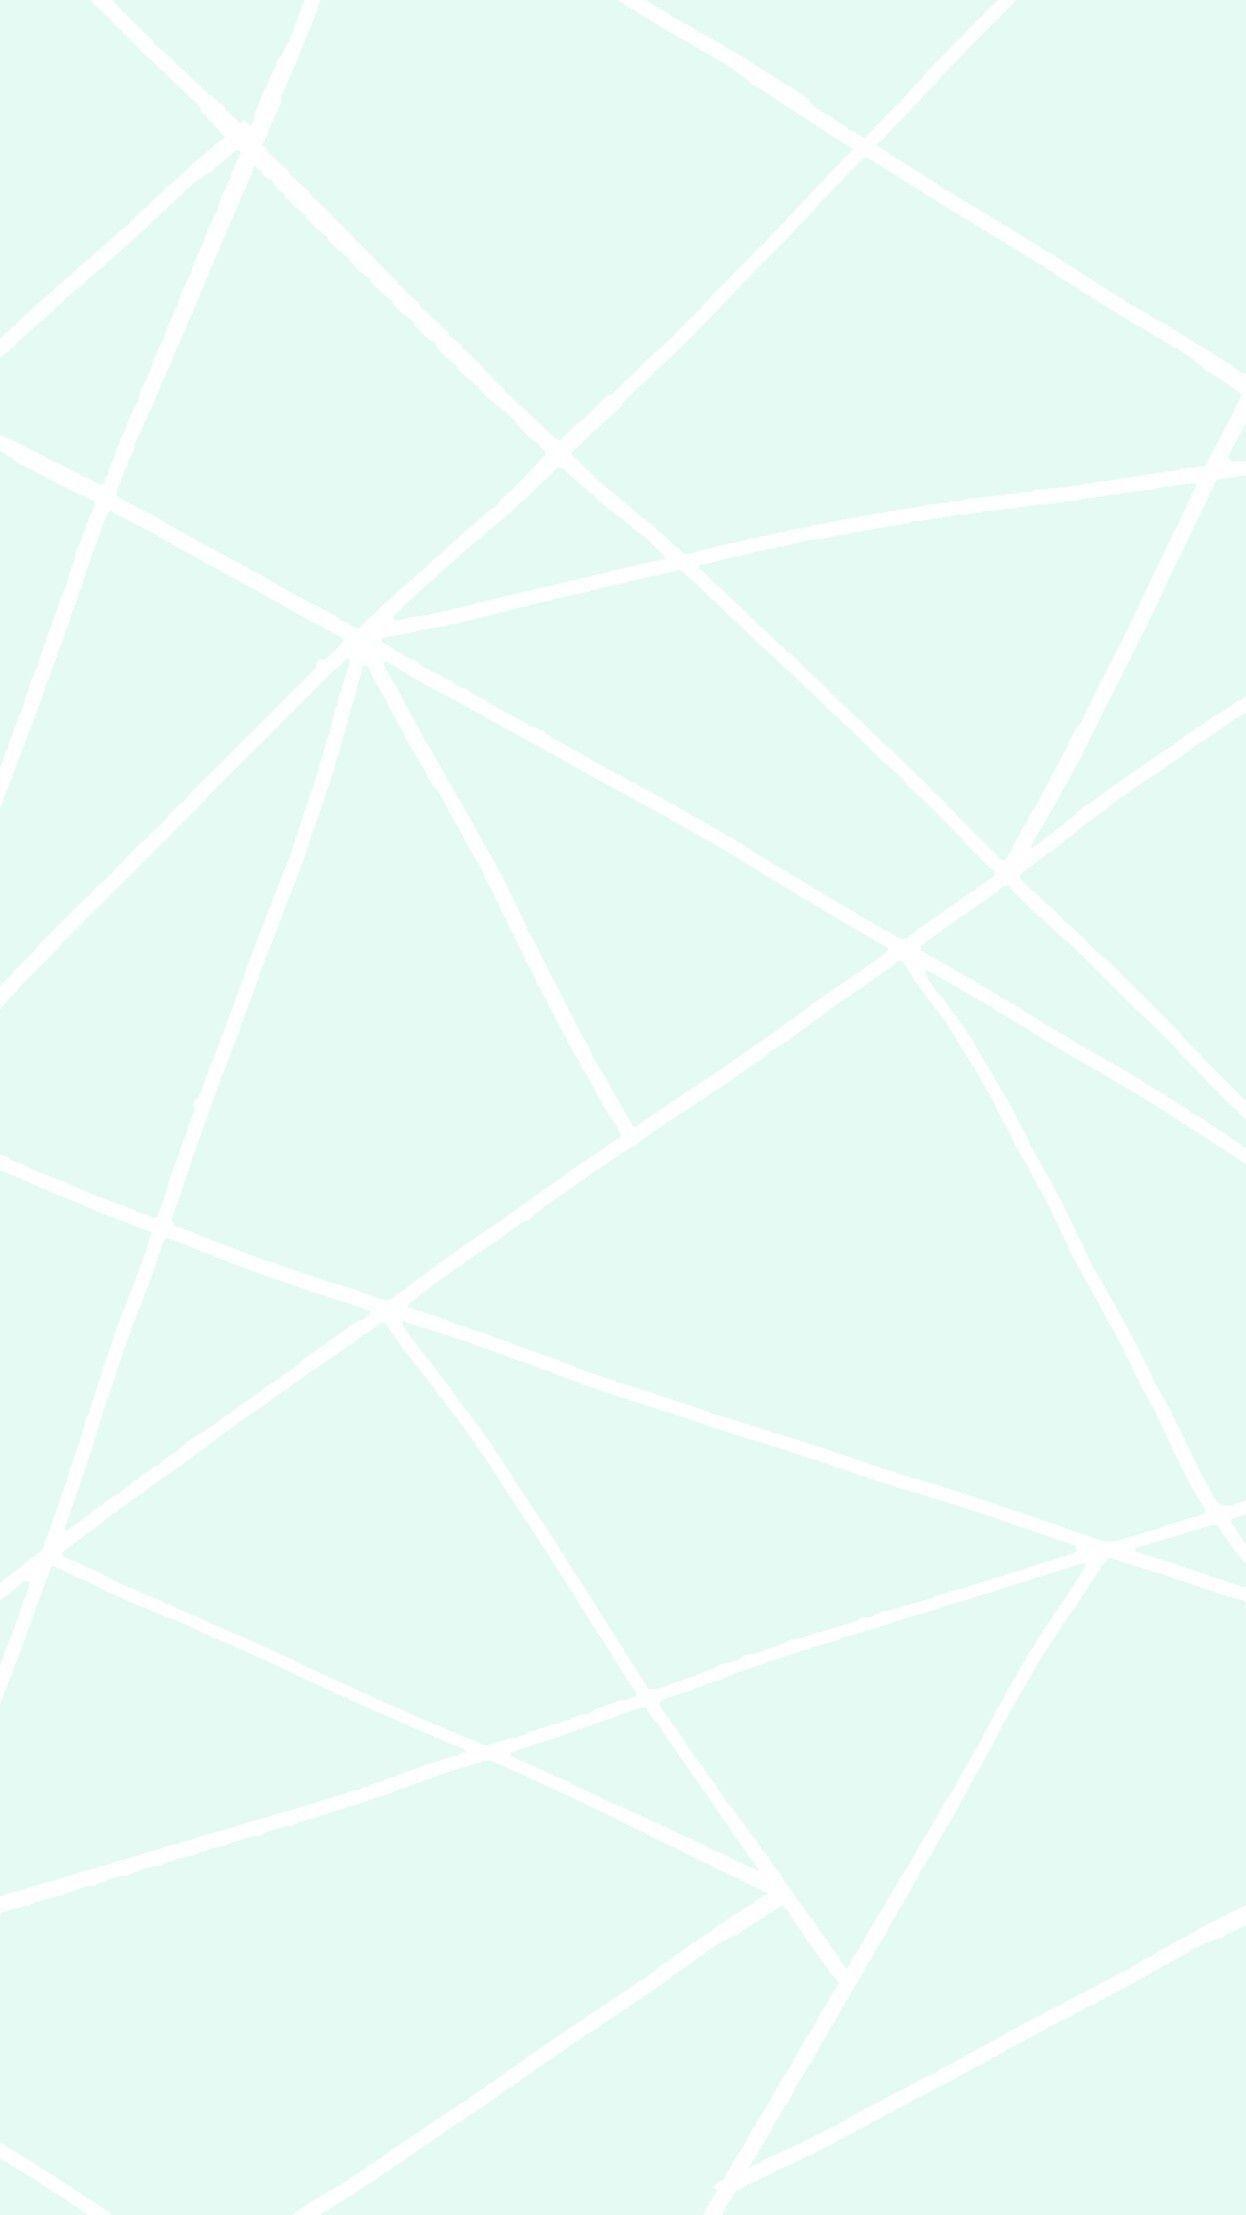 Cute Geometric Wallpapers Top Free Cute Geometric Backgrounds